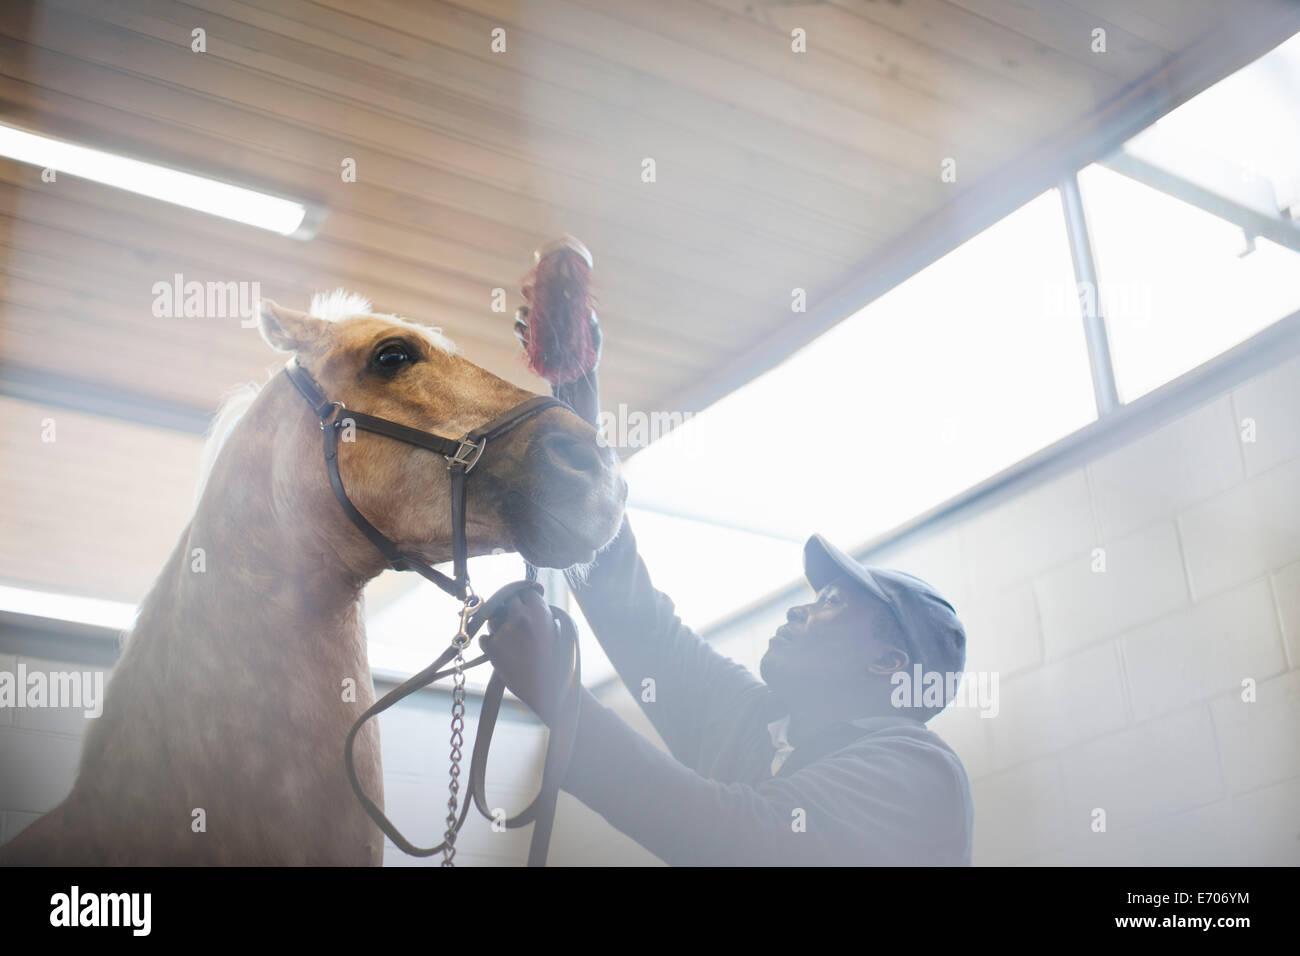 Ángulo de visión baja de grooming stablehand macho caballo nervioso Imagen De Stock